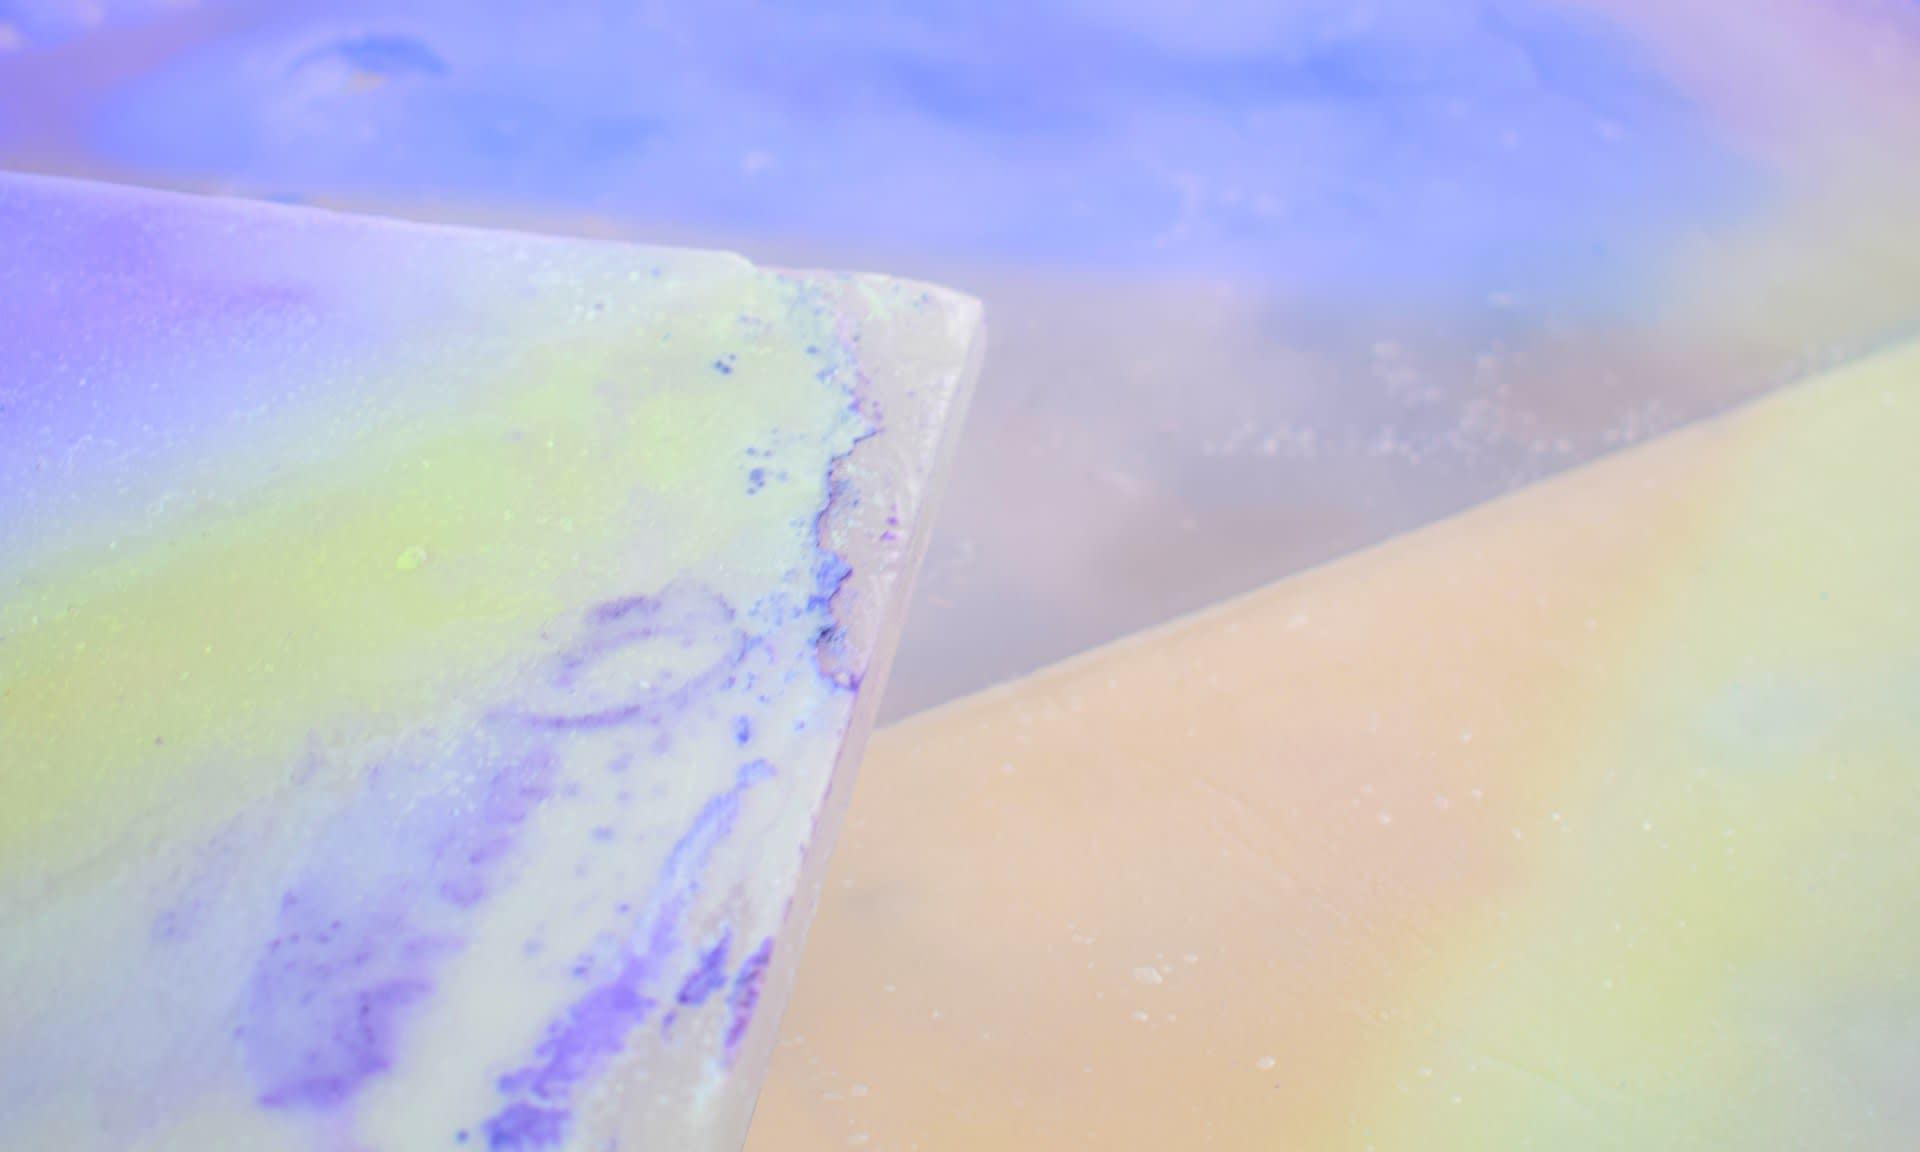 untitled (3 screens), 2020